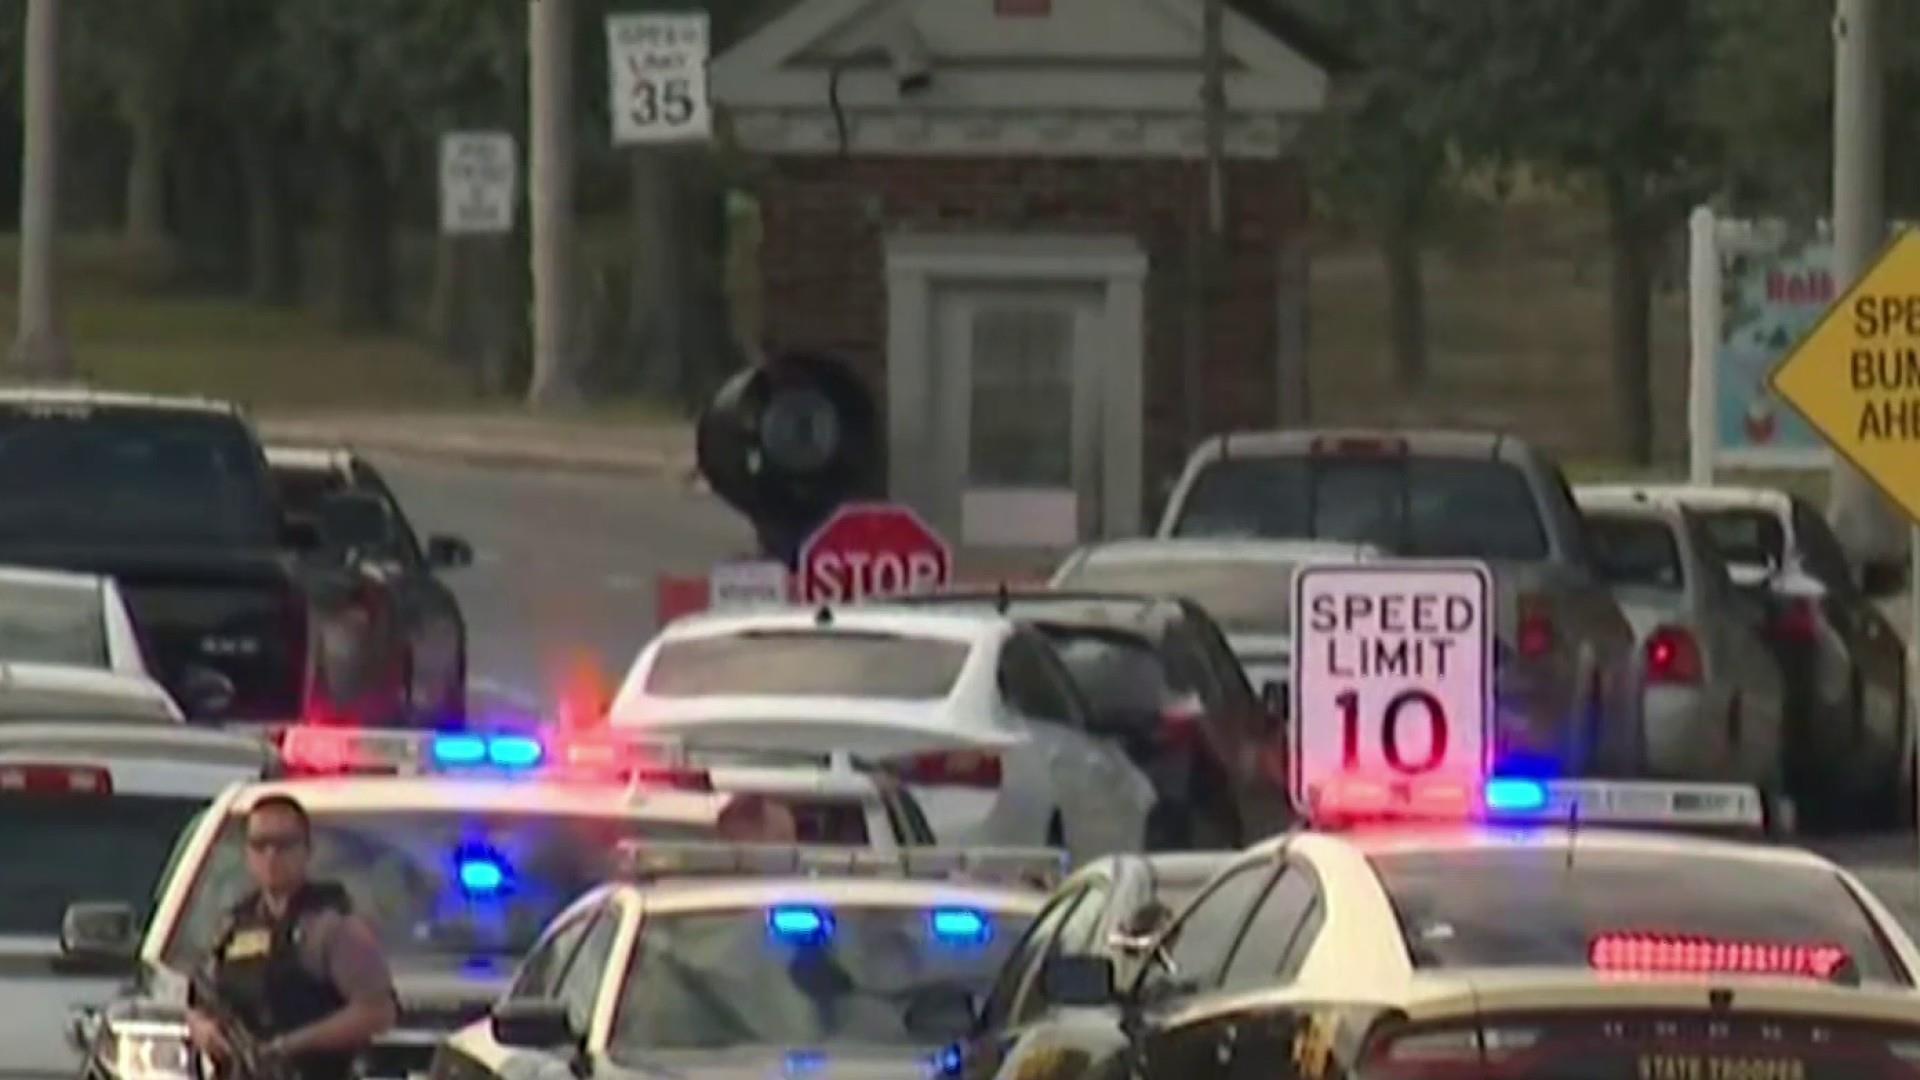 Suspected shooter at Naval Air Station Pensacola was Saudi Air Force member